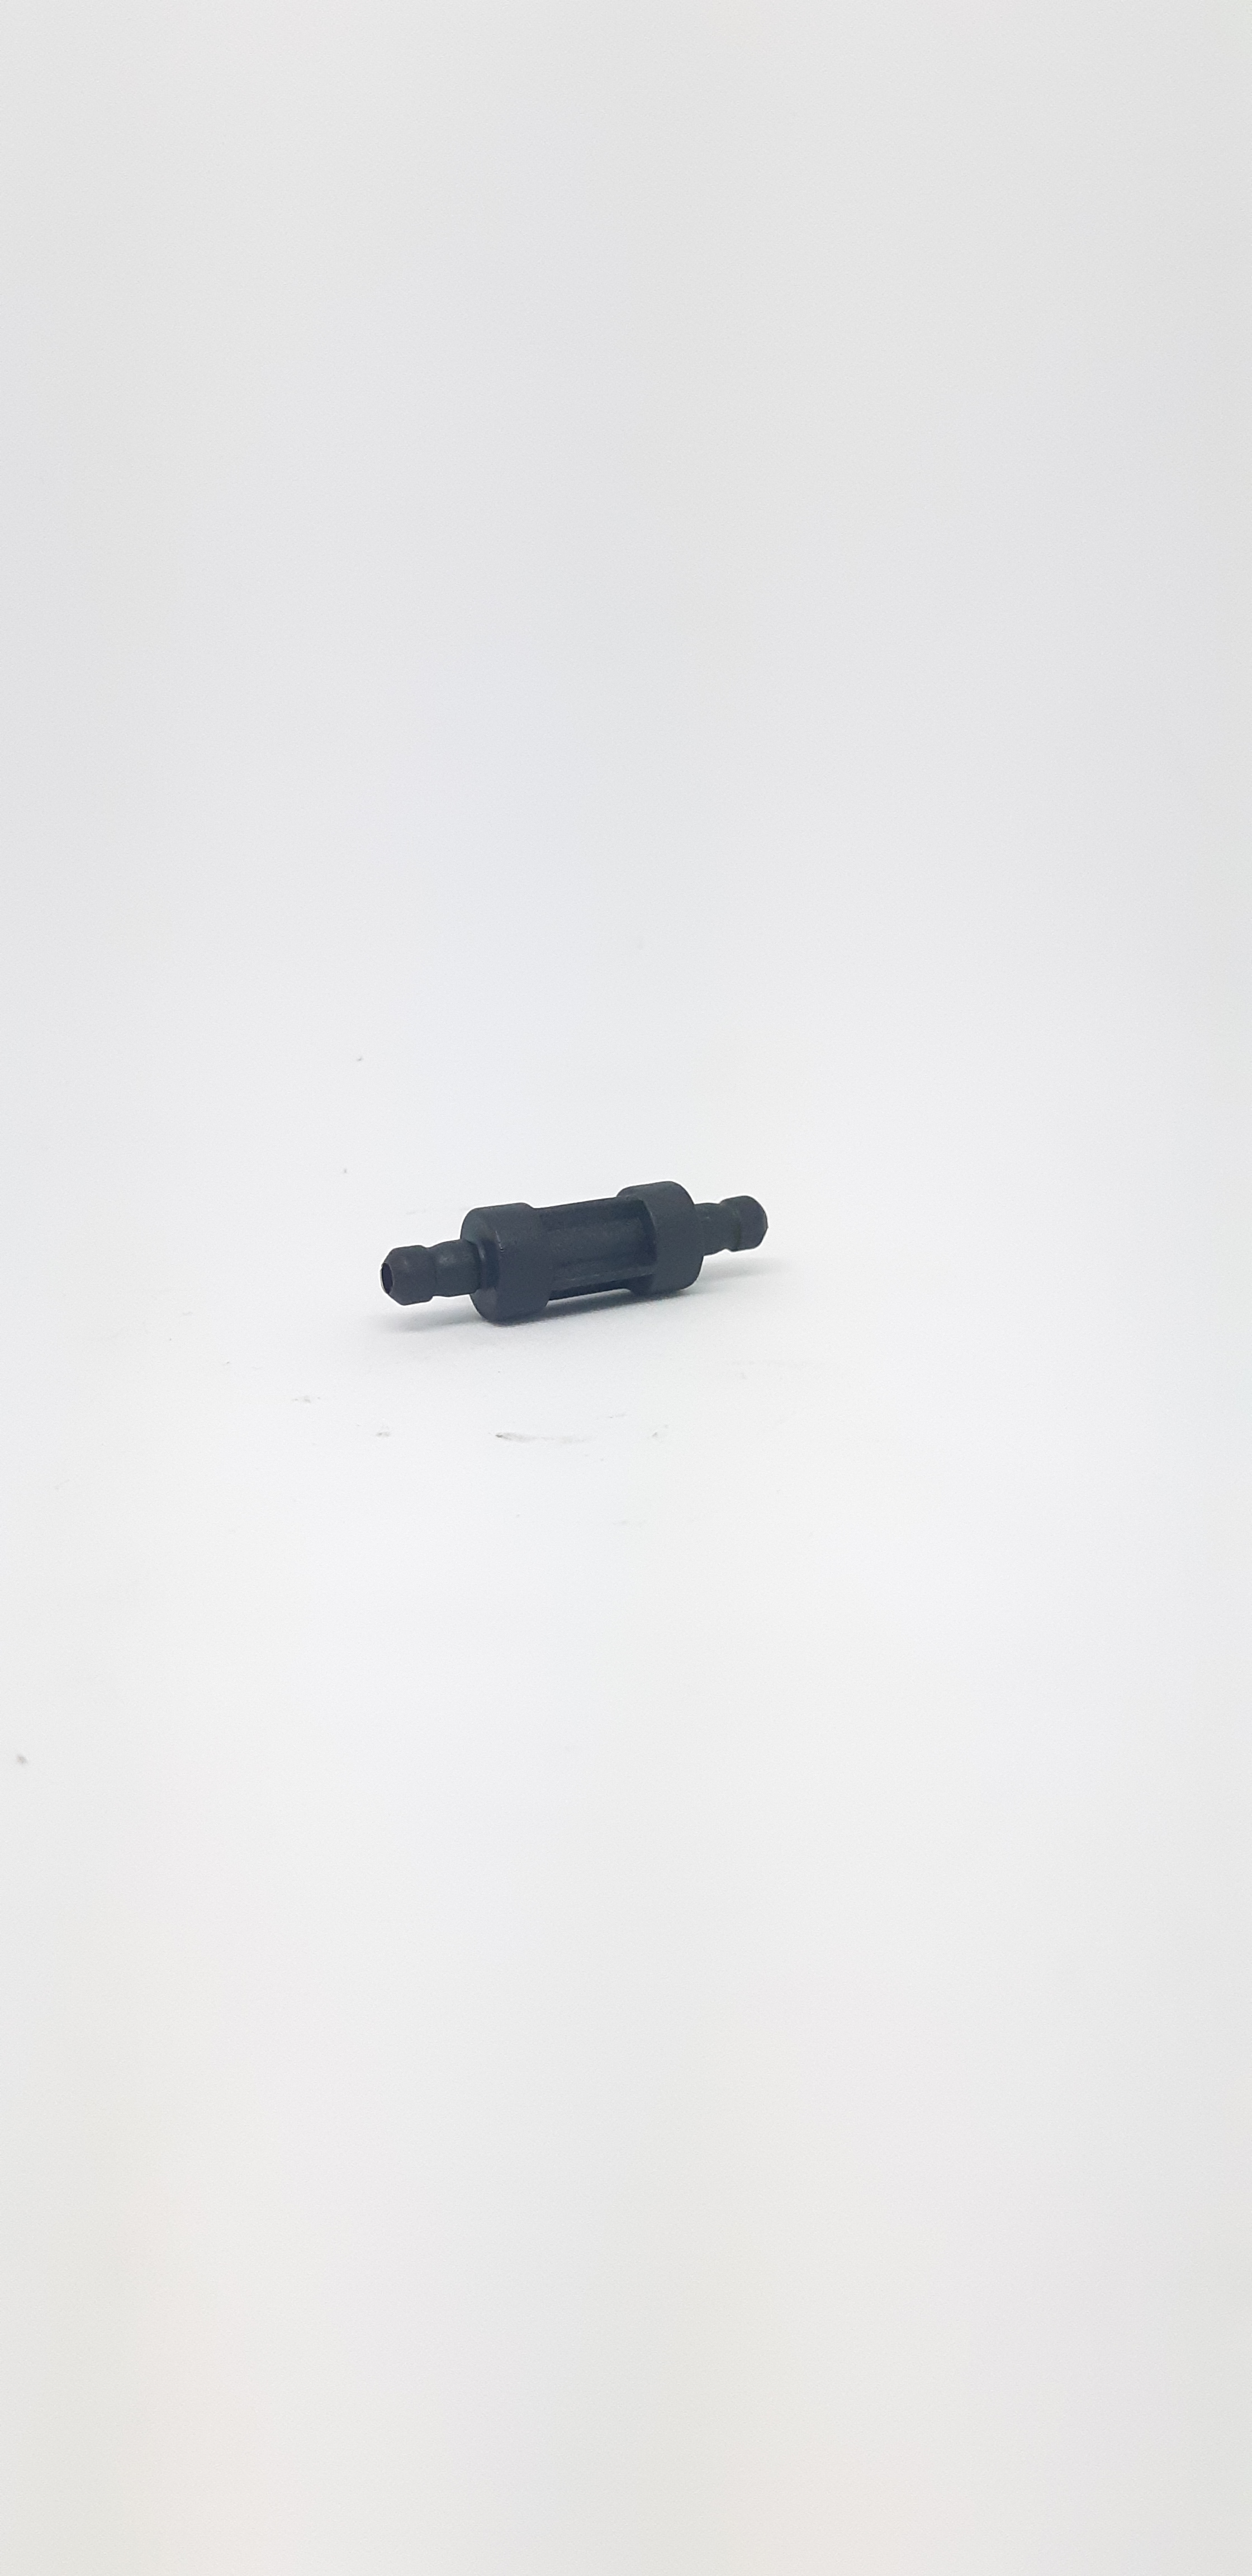 Флуид нипел за Jura GIGA - 69908